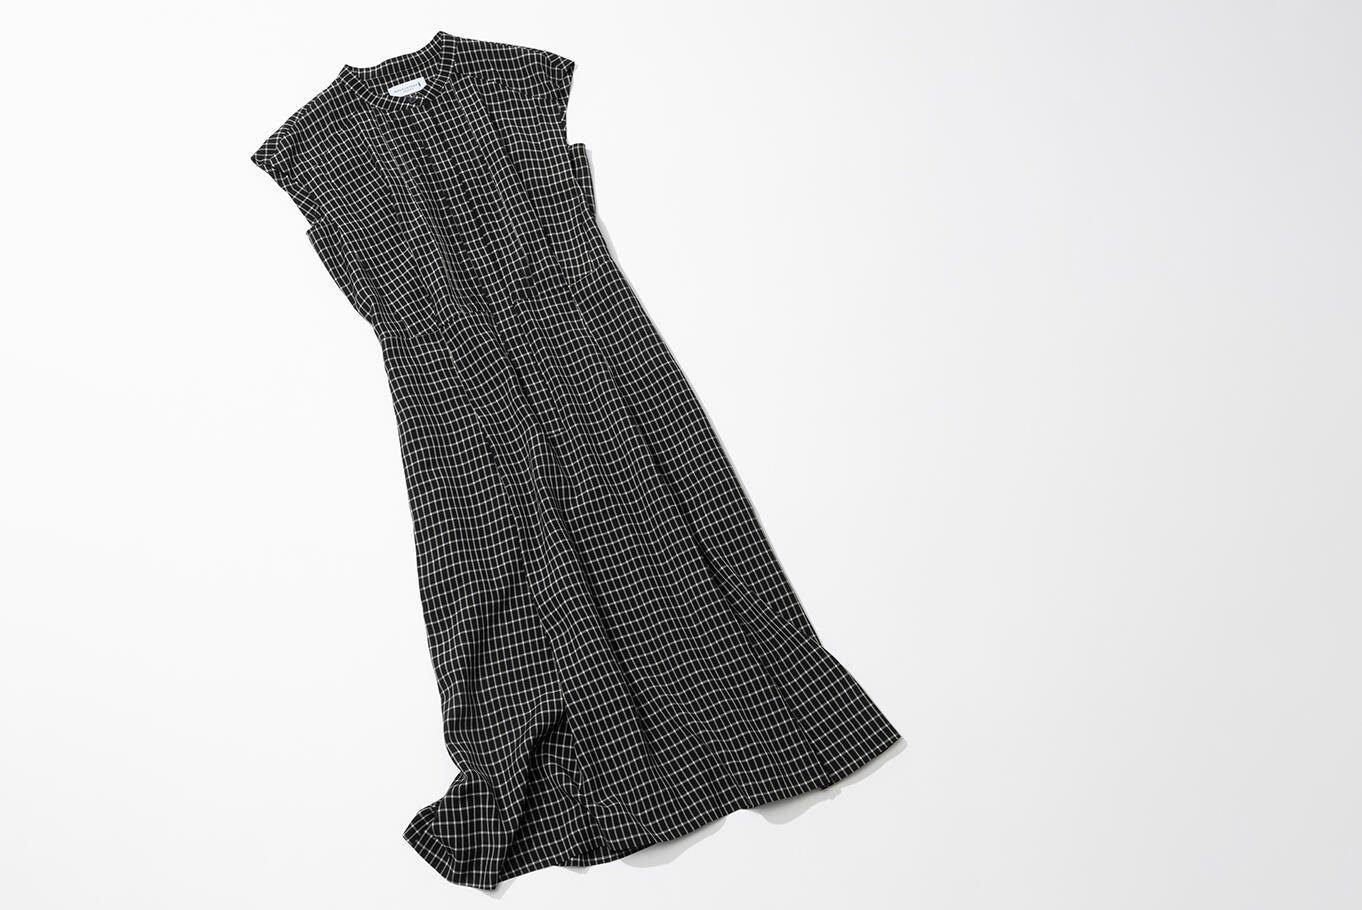 CHIC SUMMER DRESS サマードレスのシックな装い